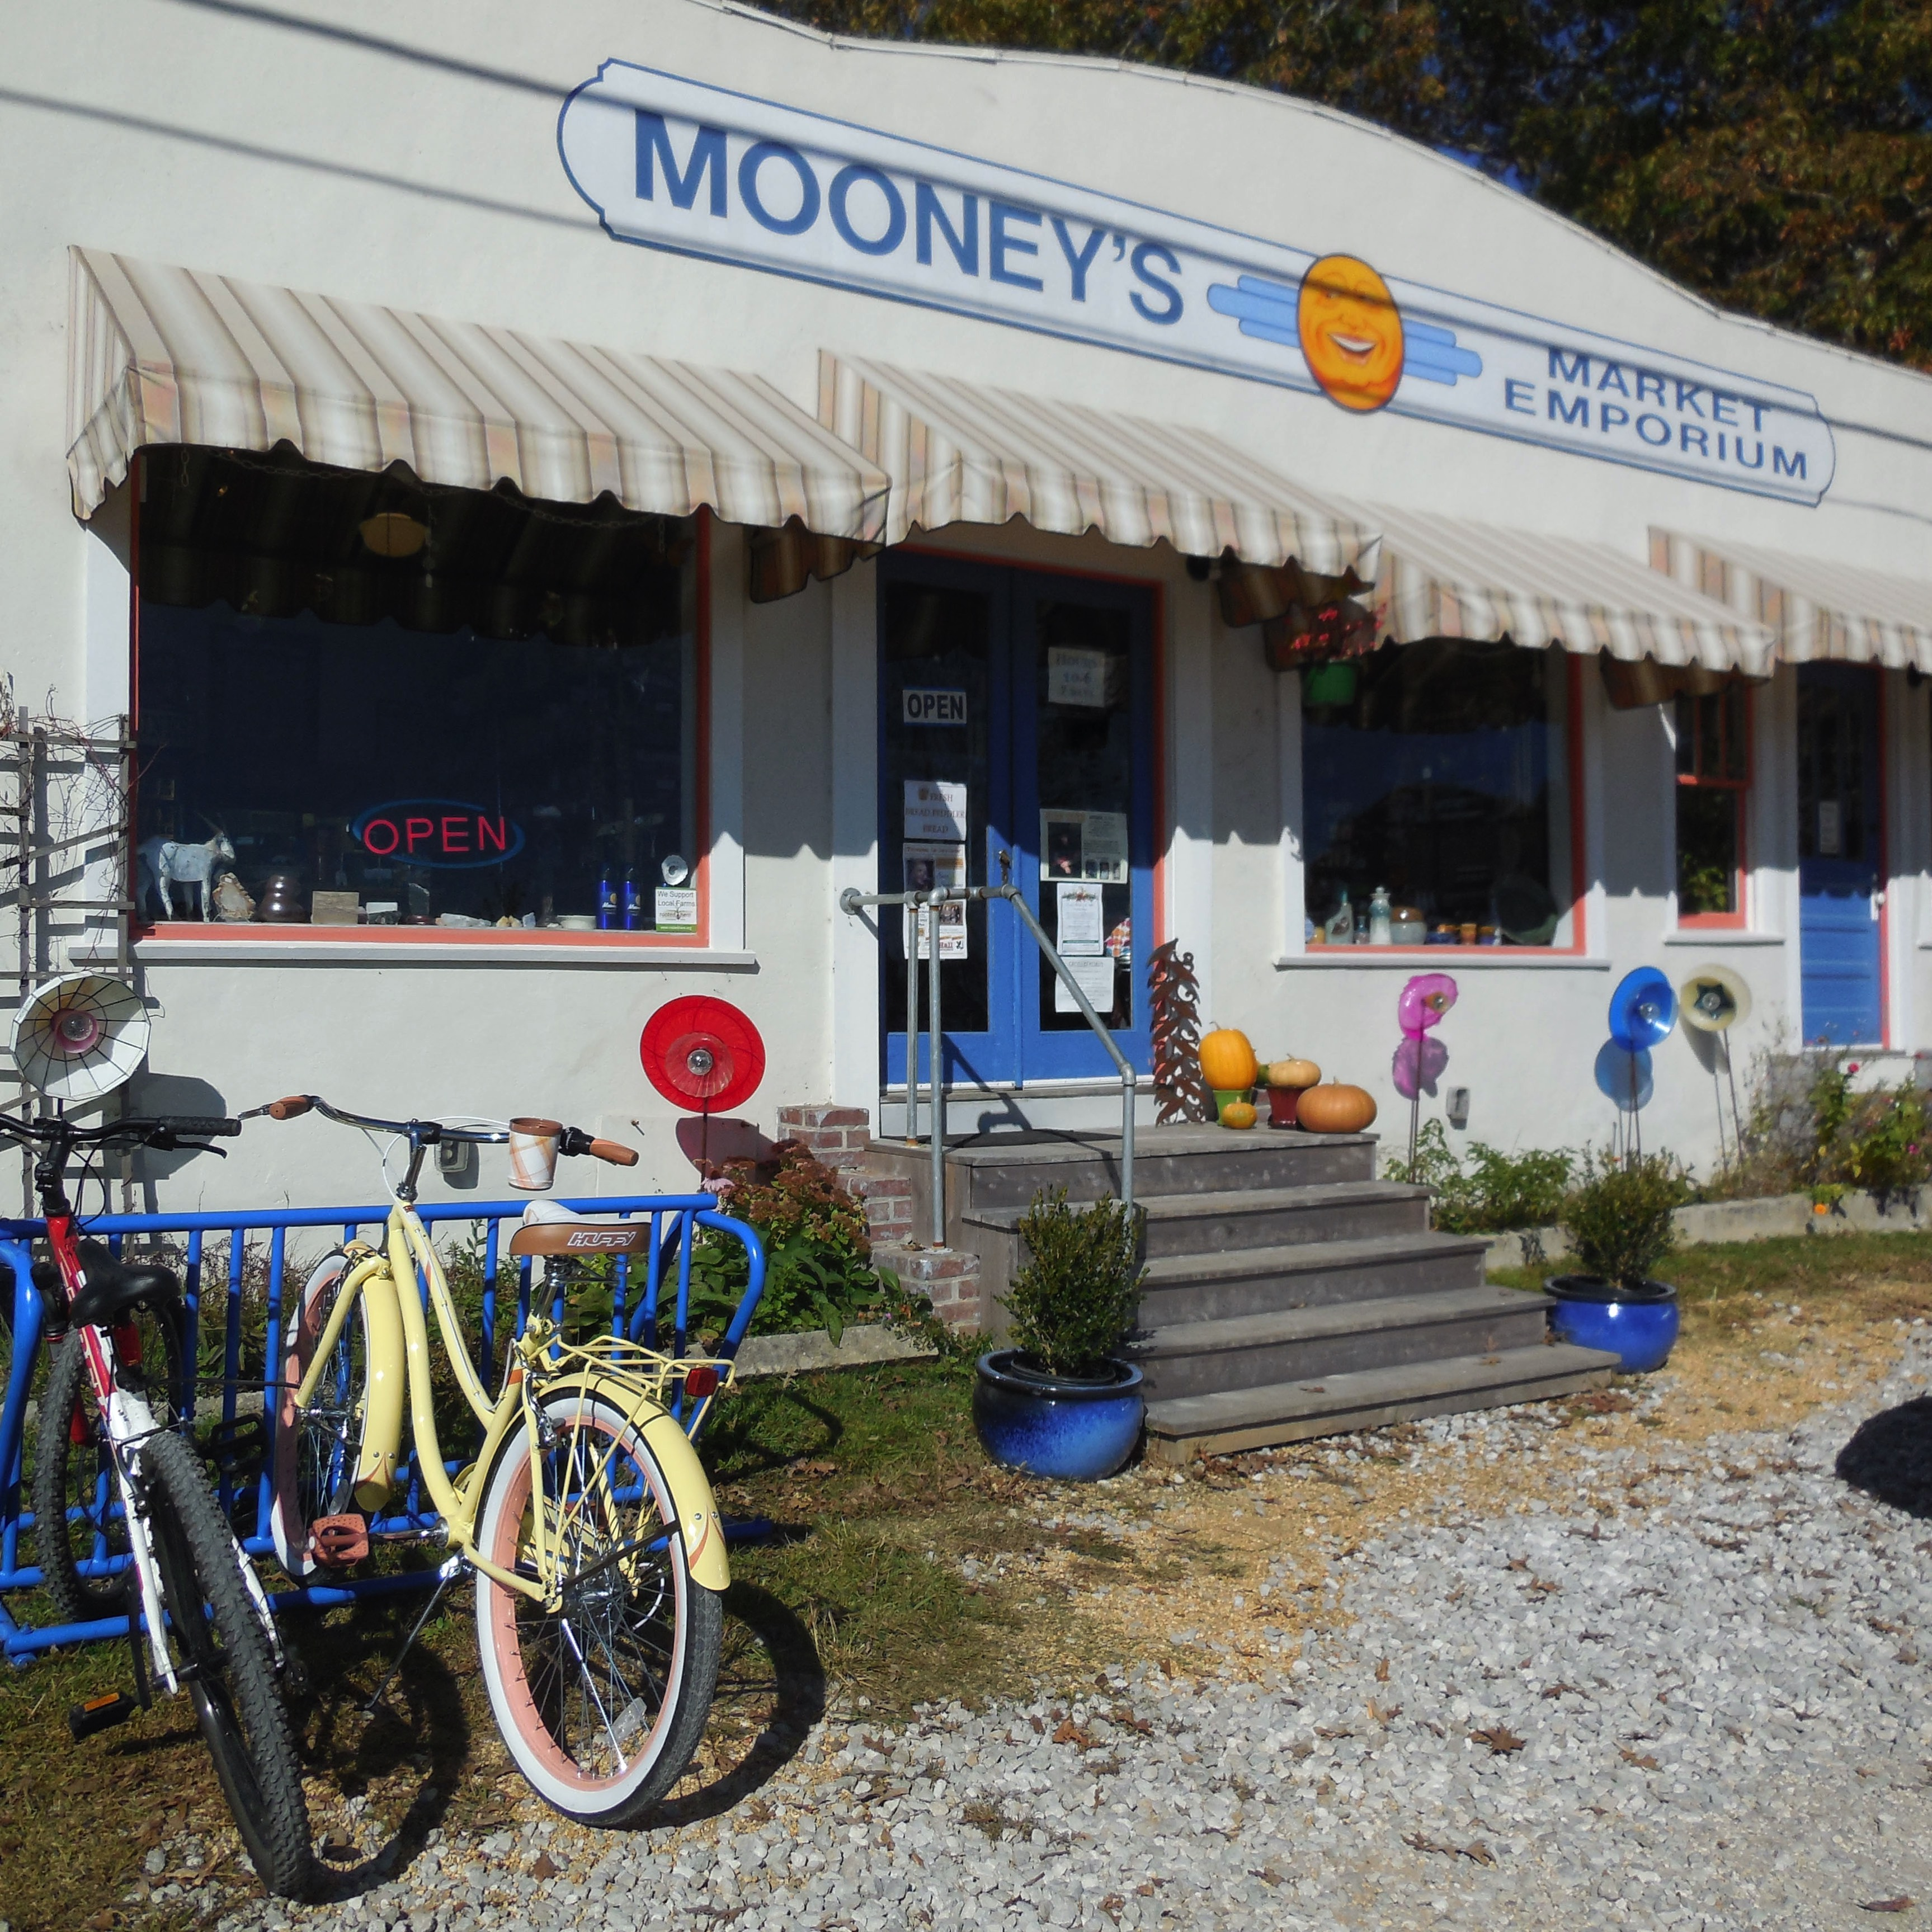 Mooney S Market Emporium And Crescent Café Joan Thomas 1265 West Main St Monteagle Tn 931 924 7400 Casual Dining